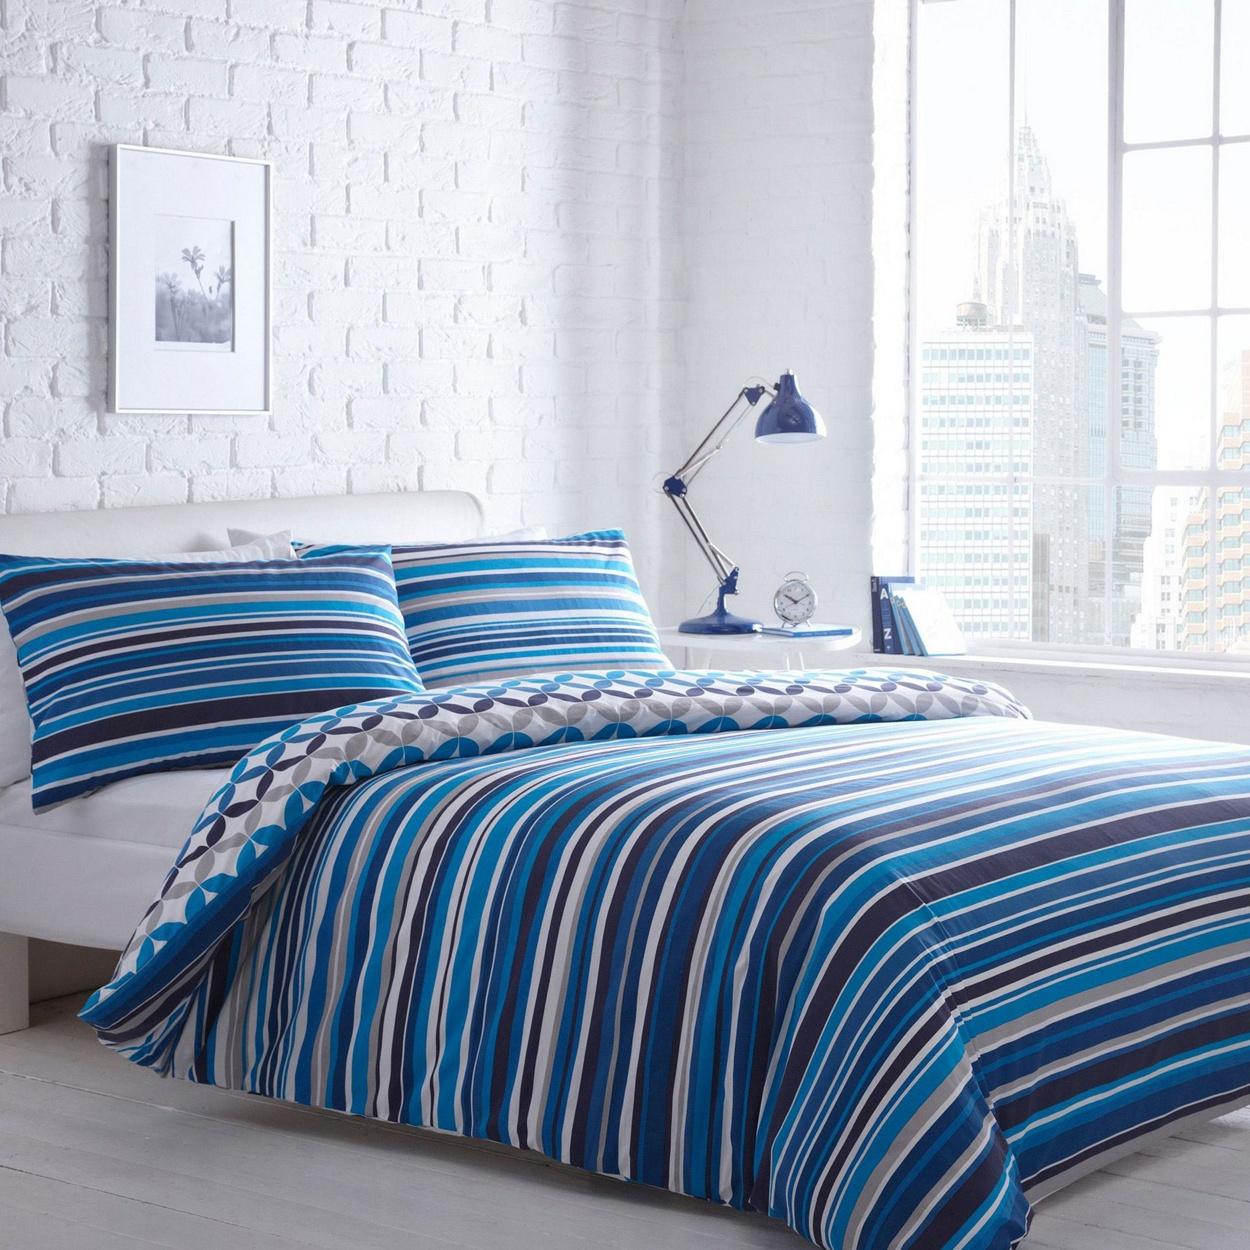 Blue and green striped bedding - Bedding Sets Home Debenhams